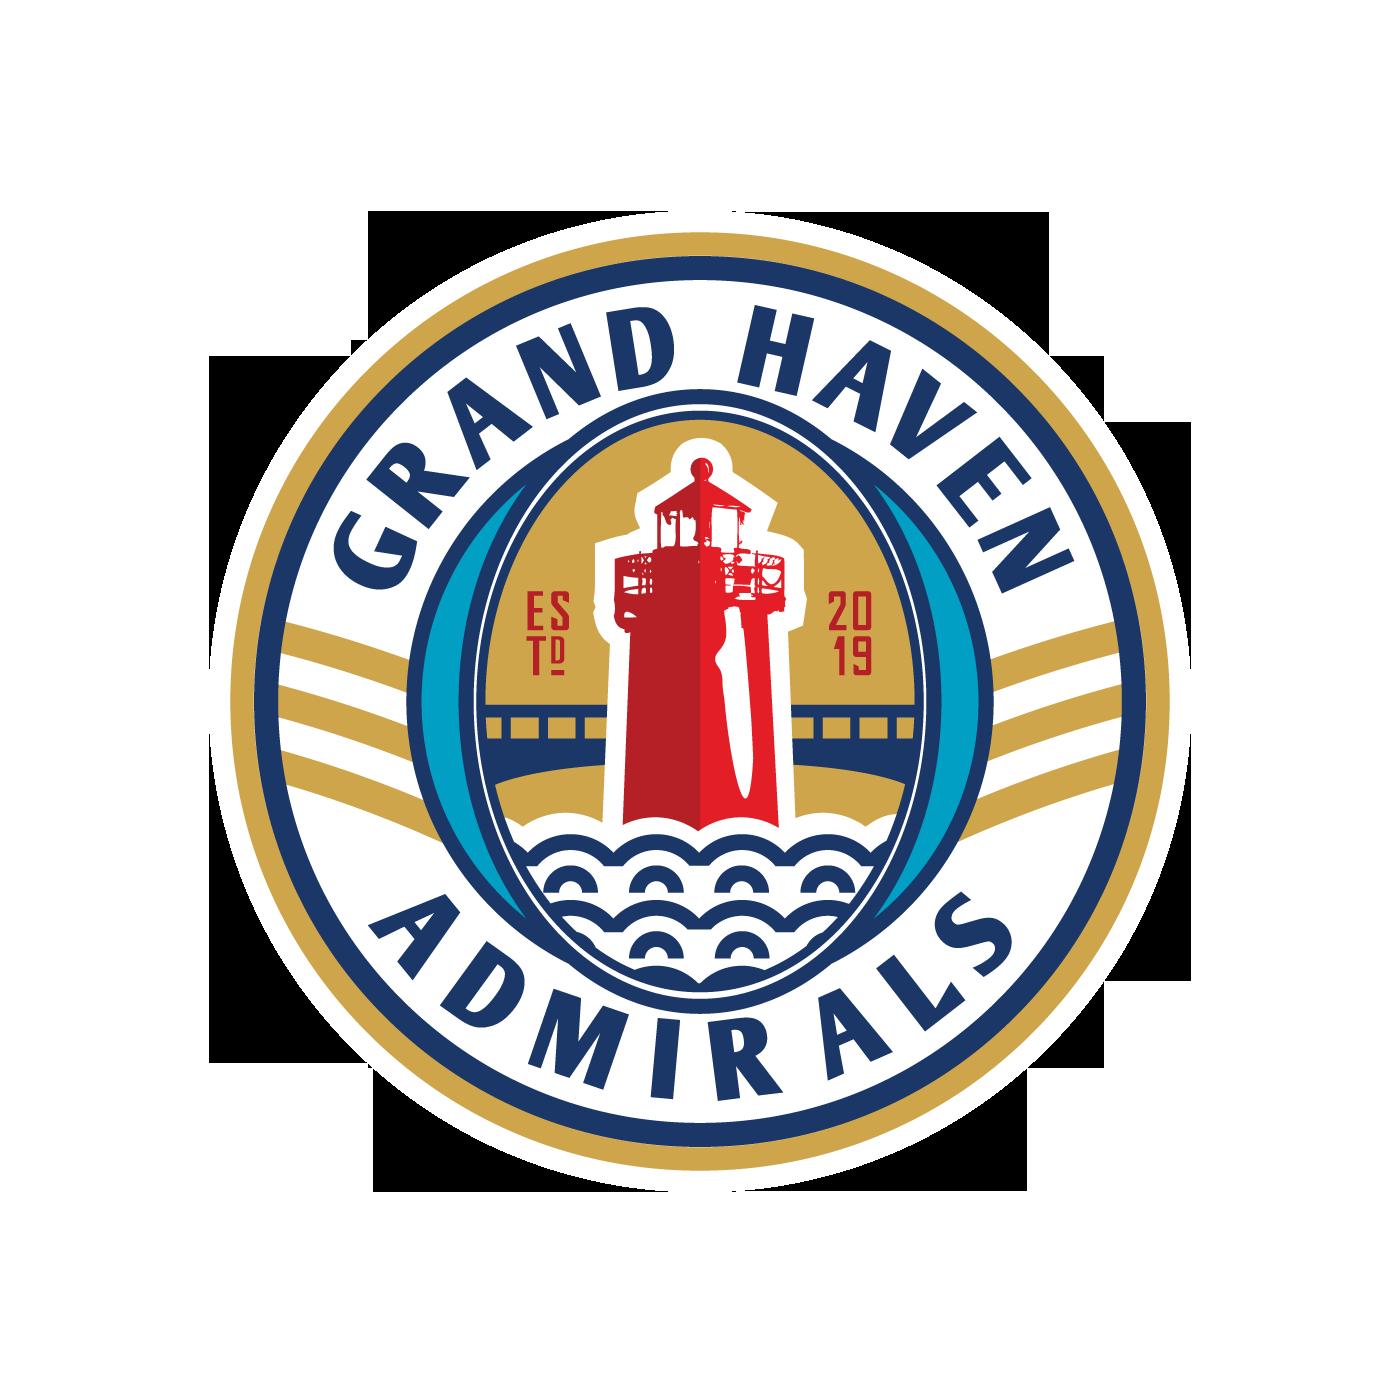 Grand Haven Admirals